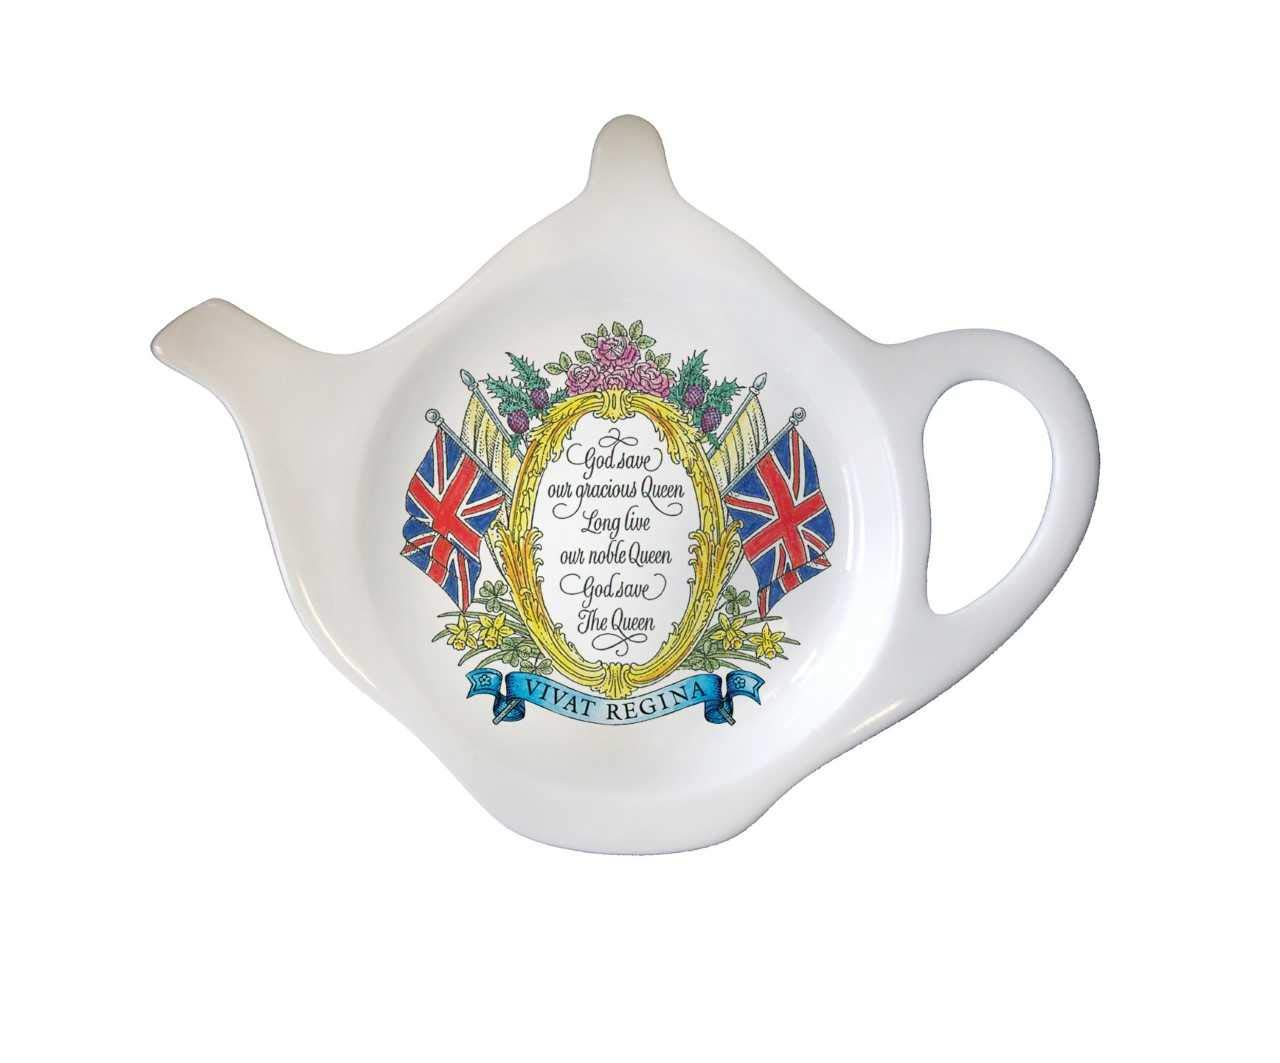 Tea Bag Coasters Tea Accessories Queen Elizabeth Royal Family Gifts for Mom Tea Lovers Teachers Ceramic Tea Pot Shape